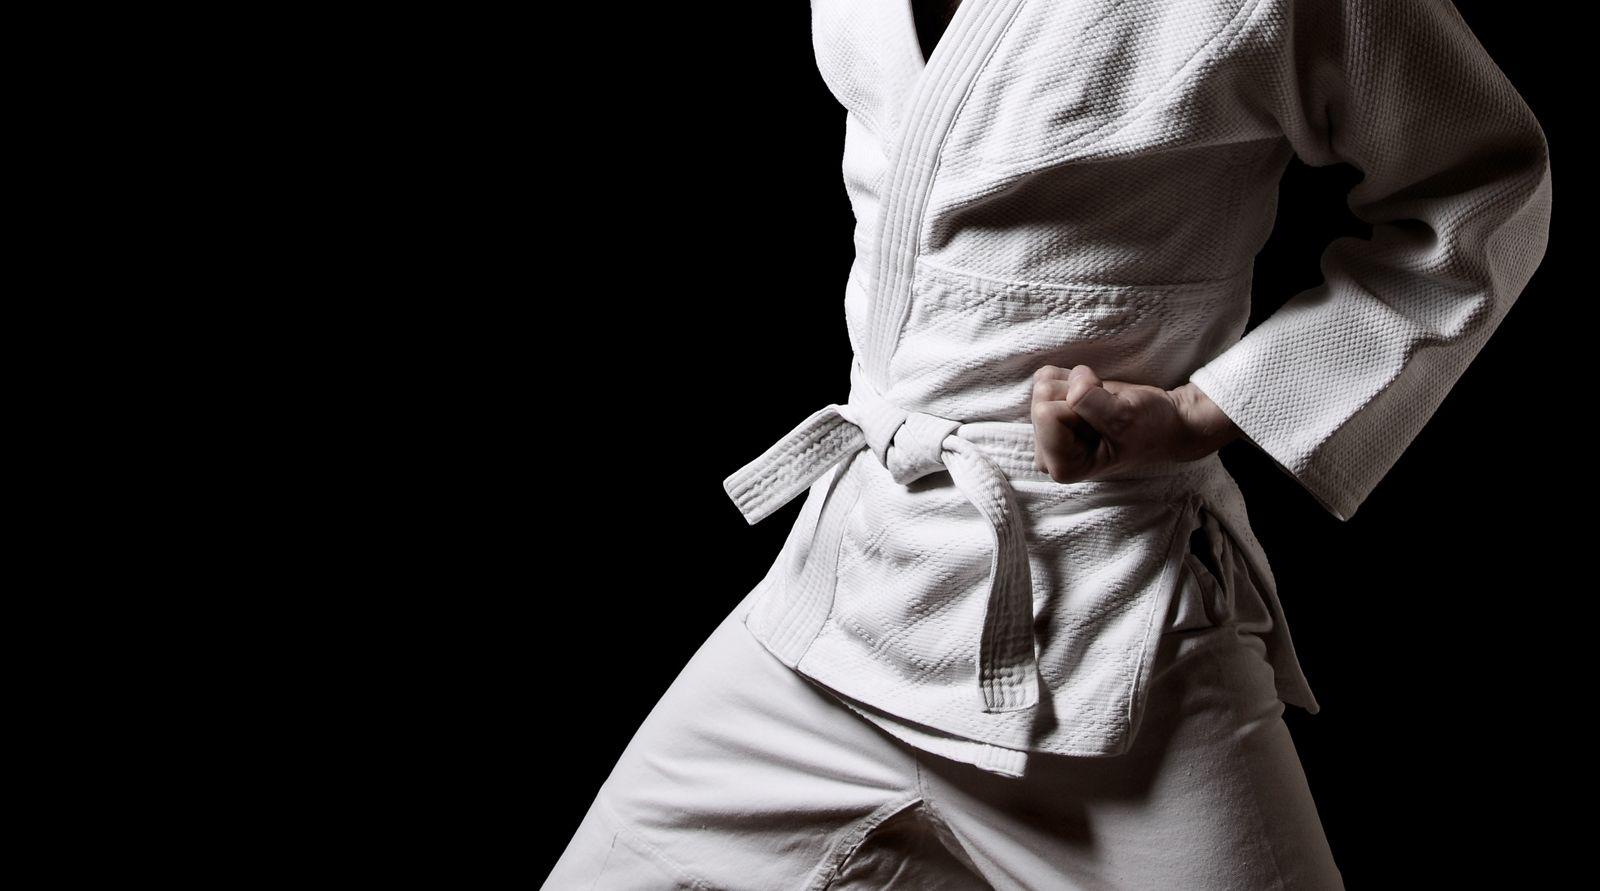 Taekwondo Hd Desktop Wallpaper Marcial Artes Marciales Y Leer